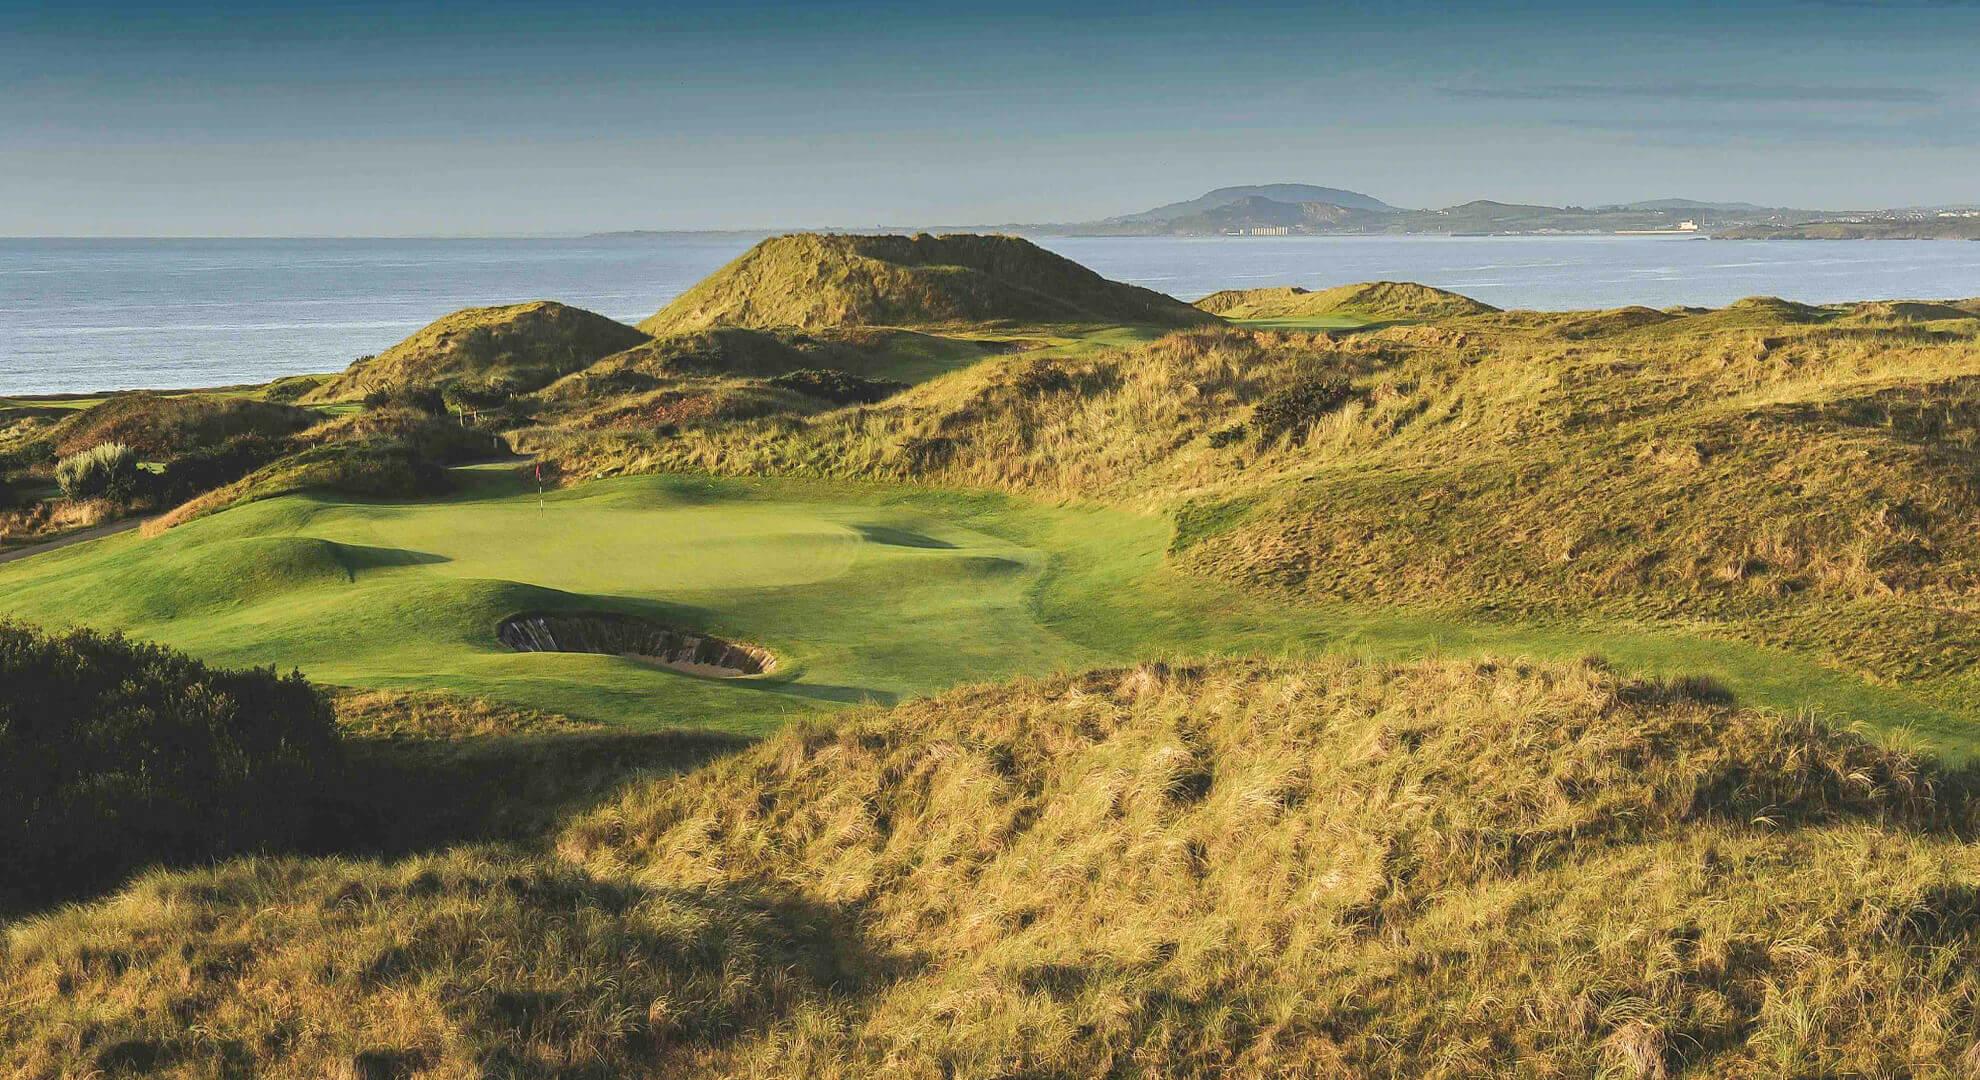 European Club Golf Course, Dublin, Ireland